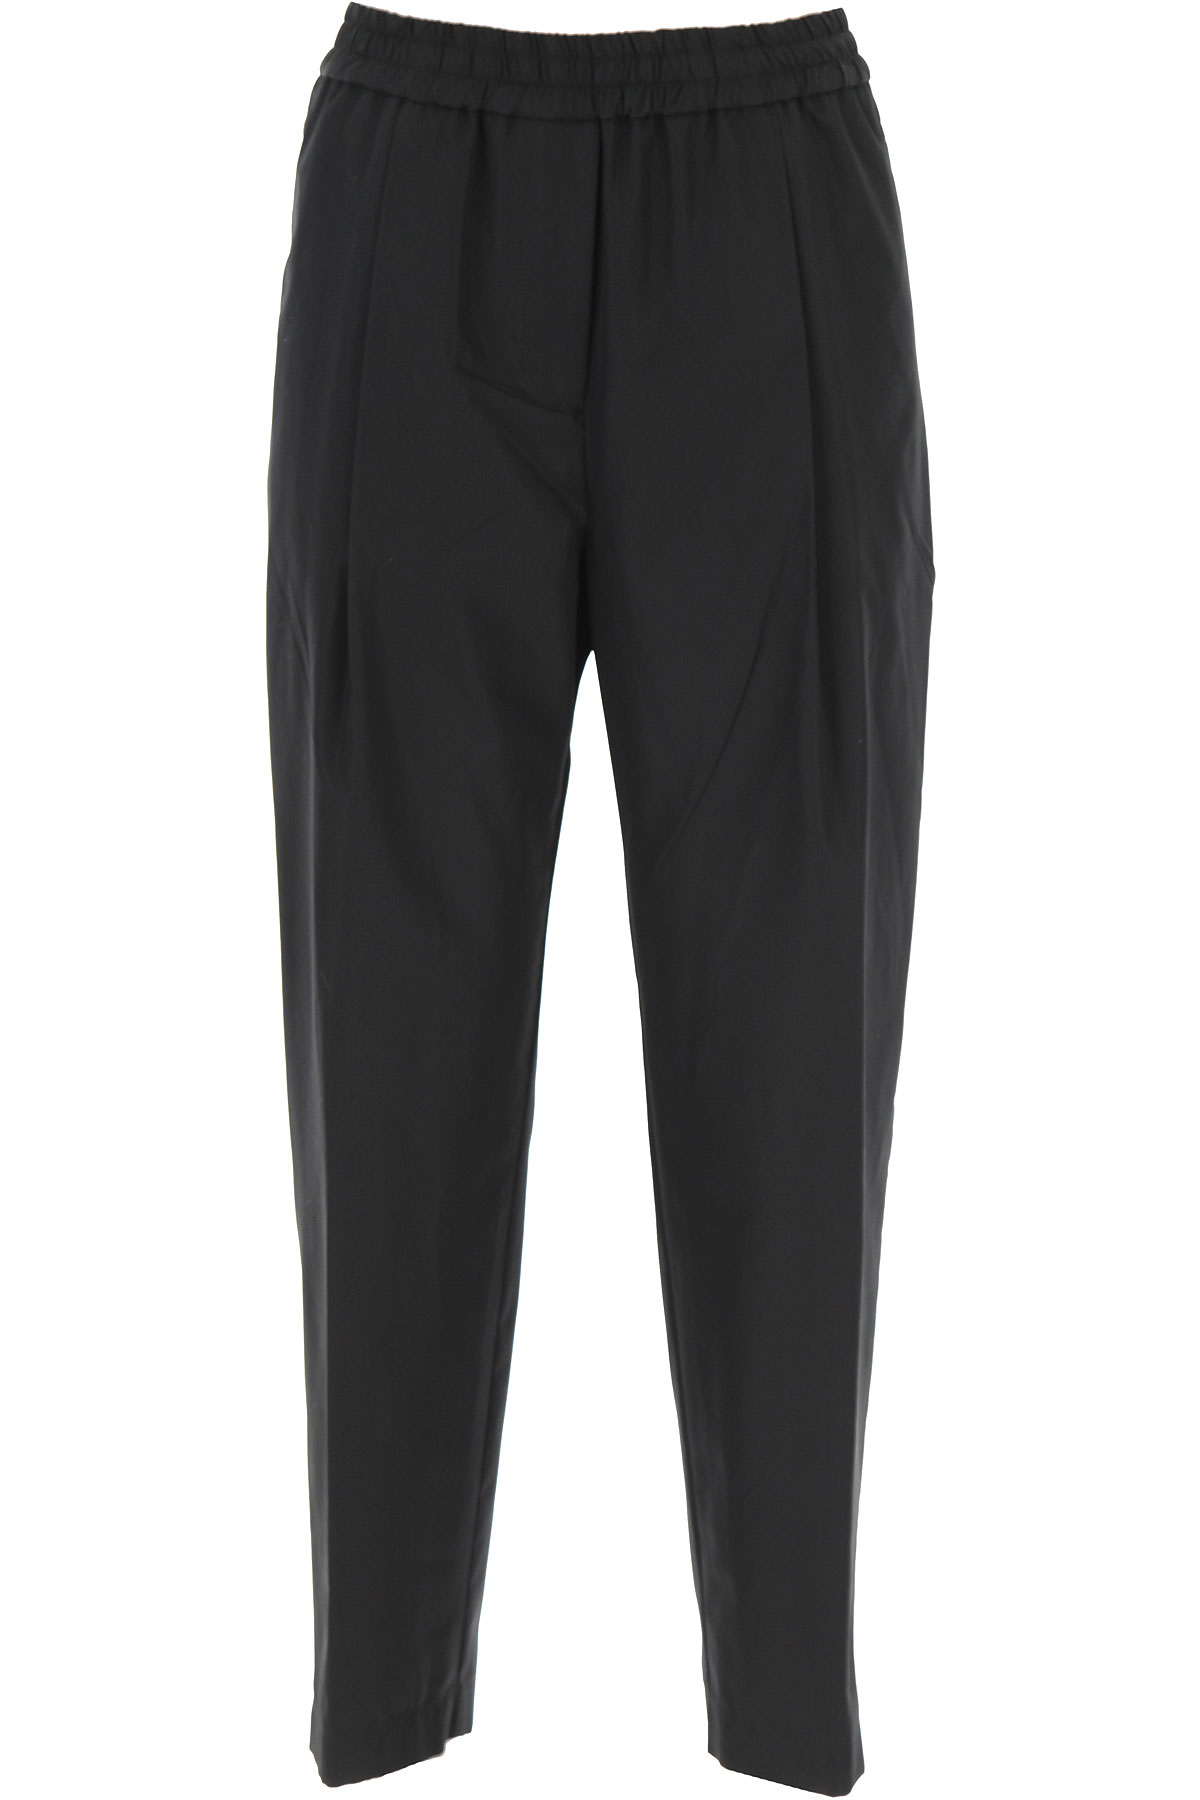 Aspesi Pants for Women On Sale, Black, Cotton, 2019, 24 26 28